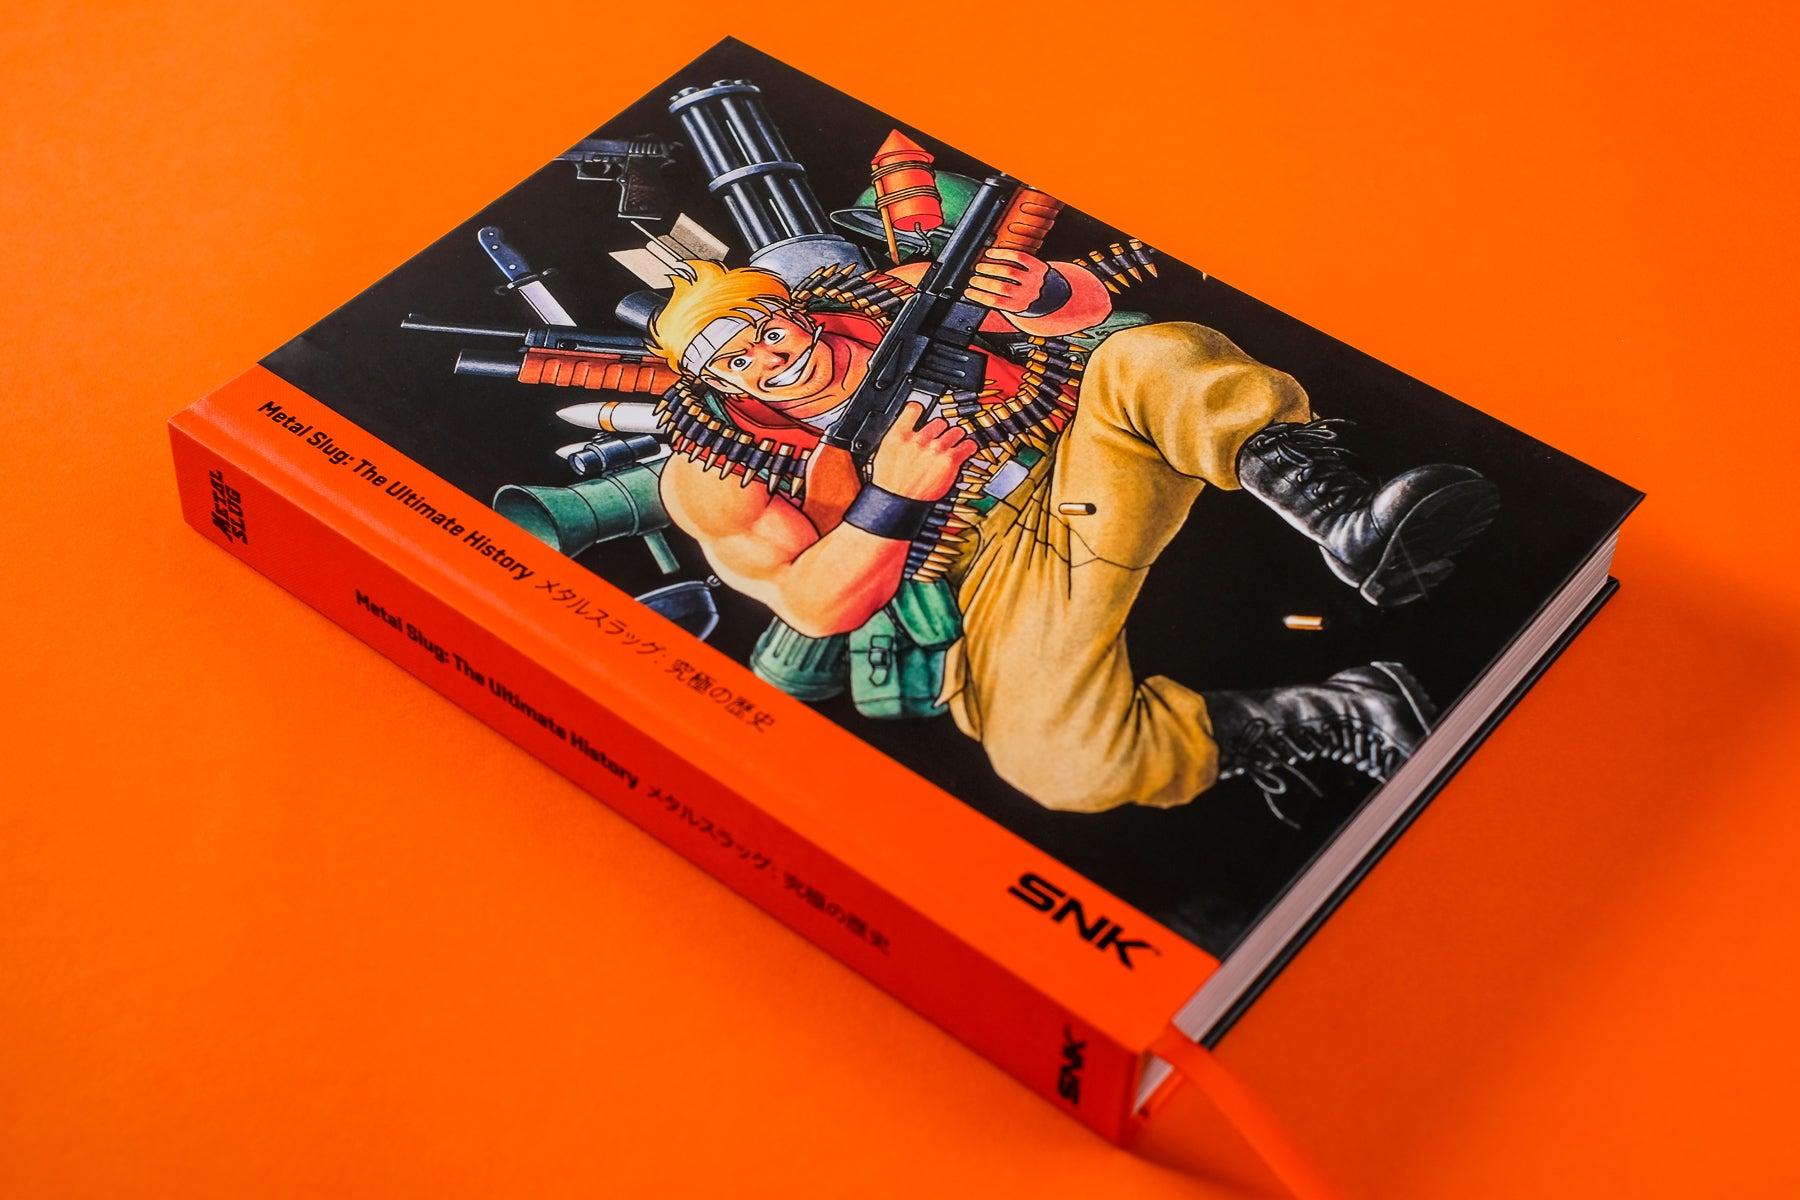 Metal Slug: The Ultimate History Is A Very Impressive Book